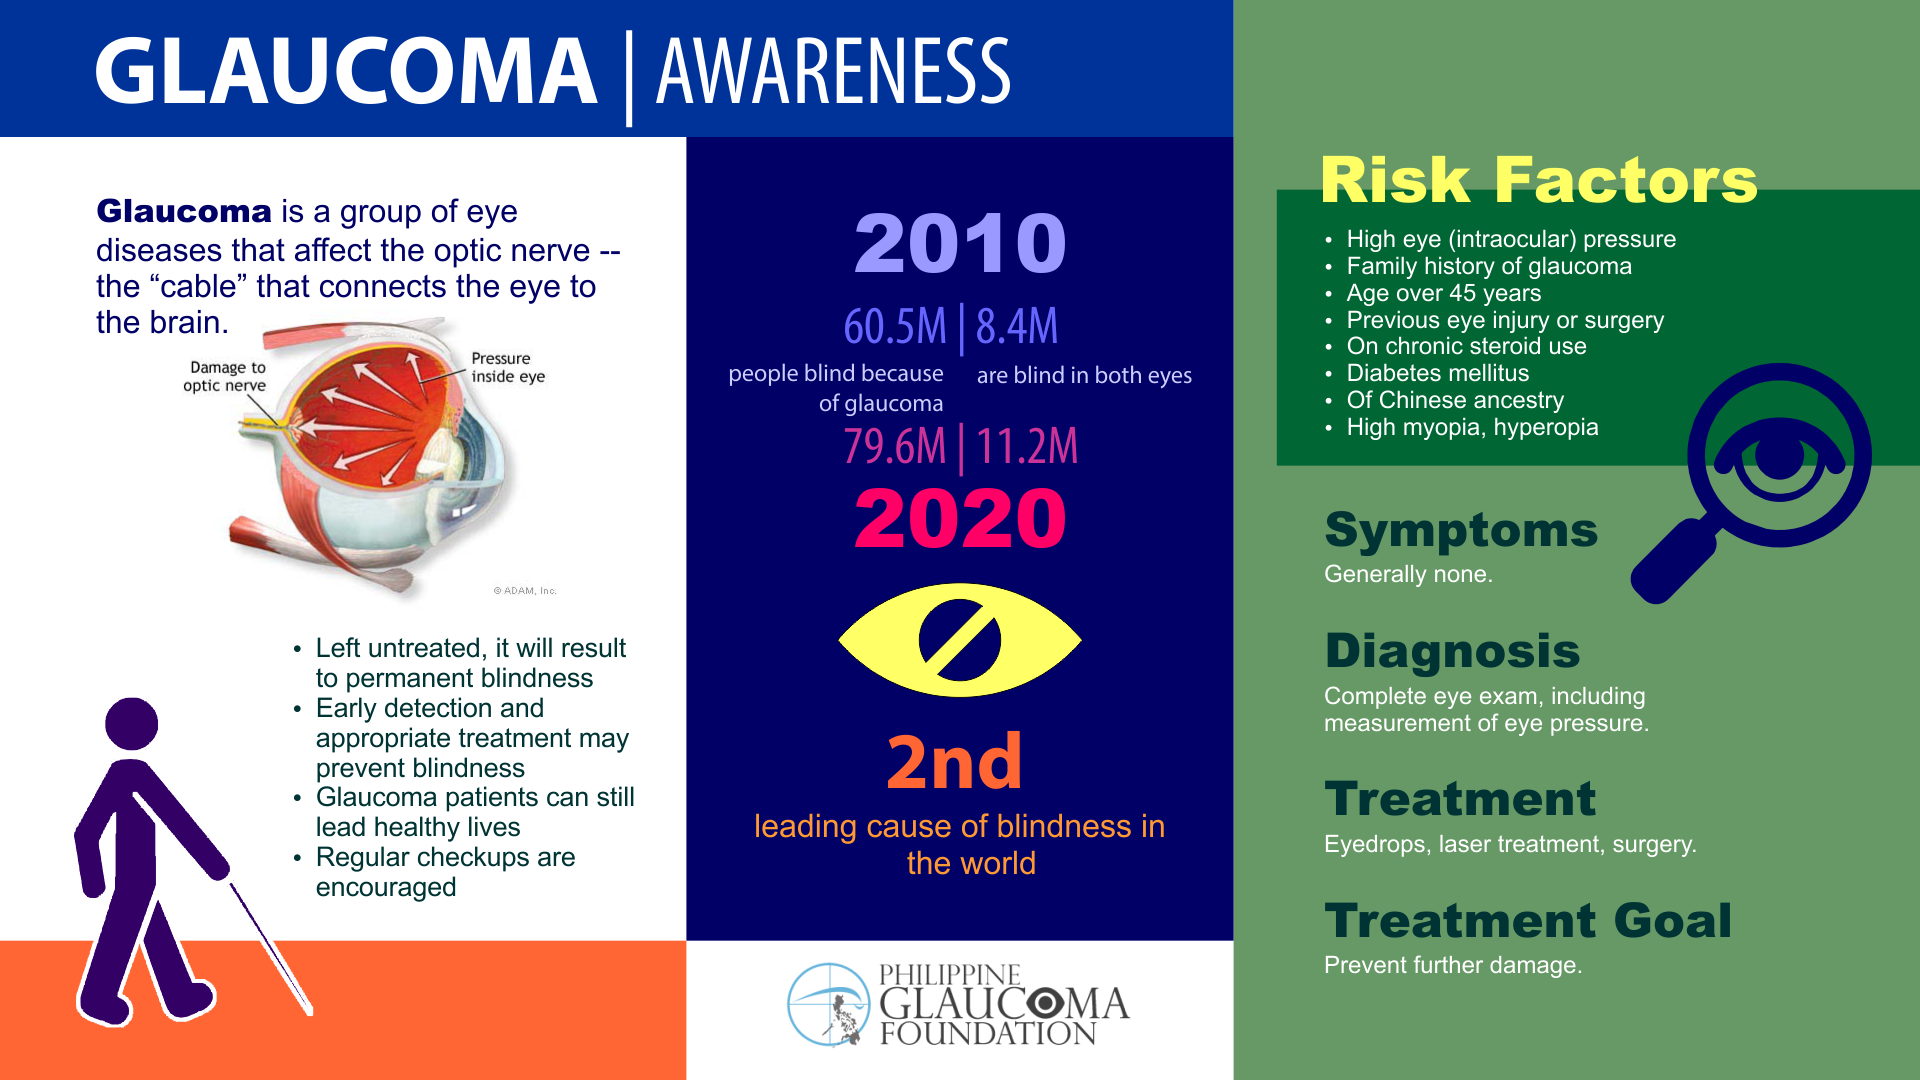 Glaucoma pgf-infographic-2015